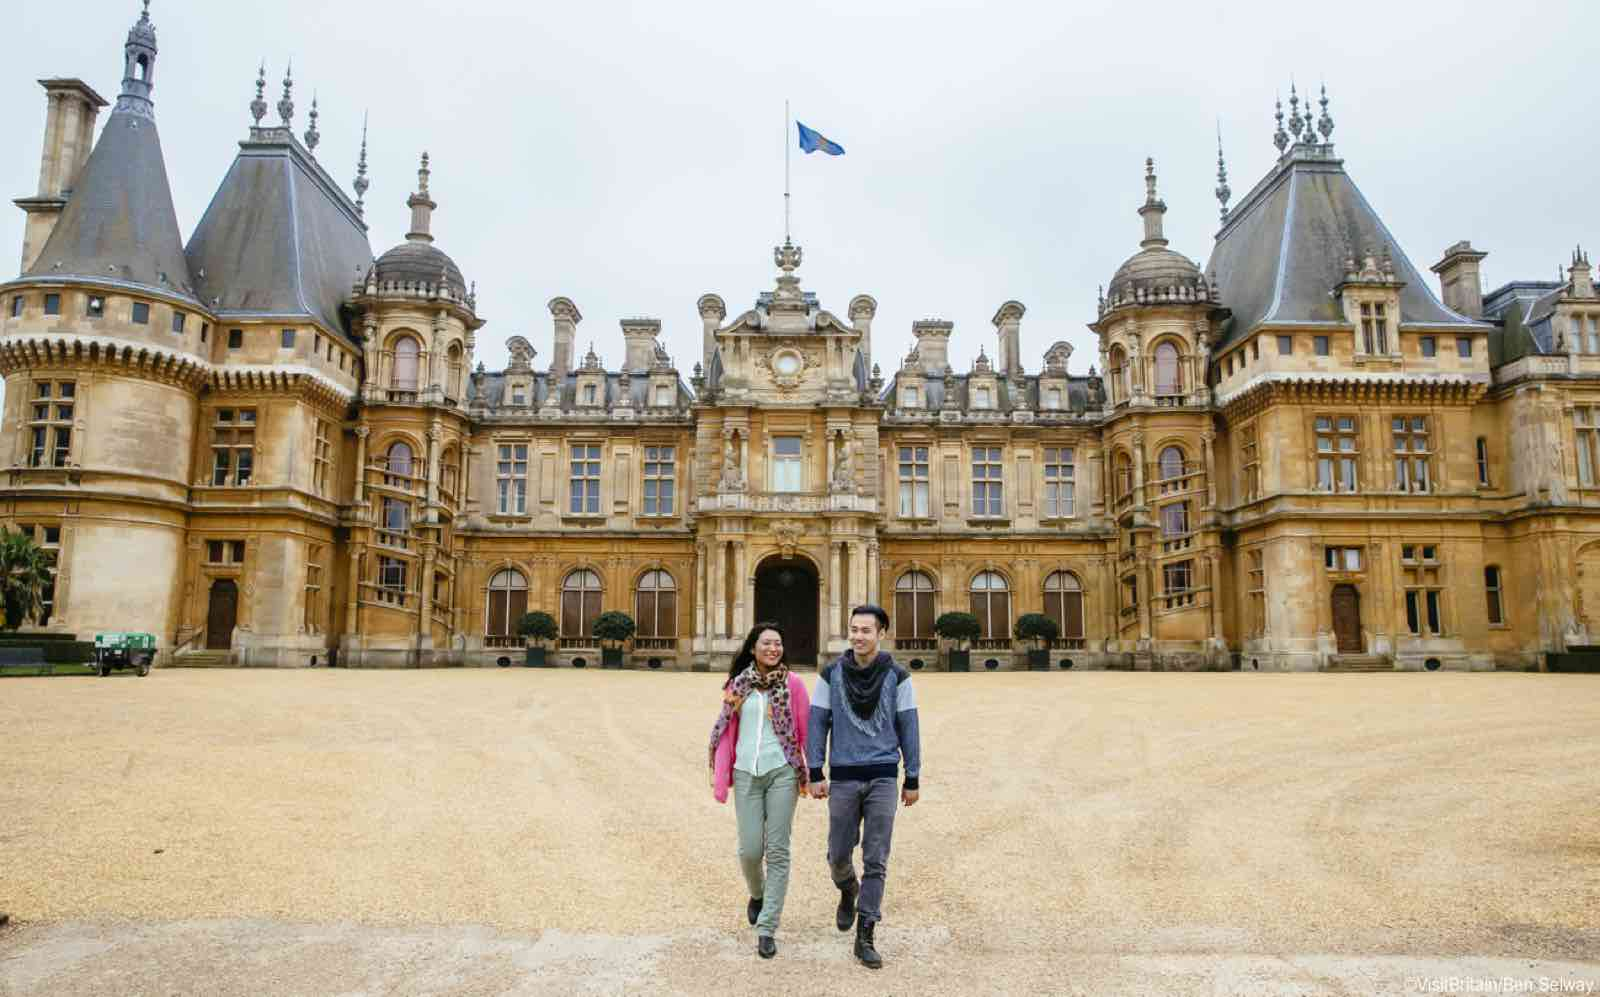 A couple enjoying the morning walk at Waddesdon Manor